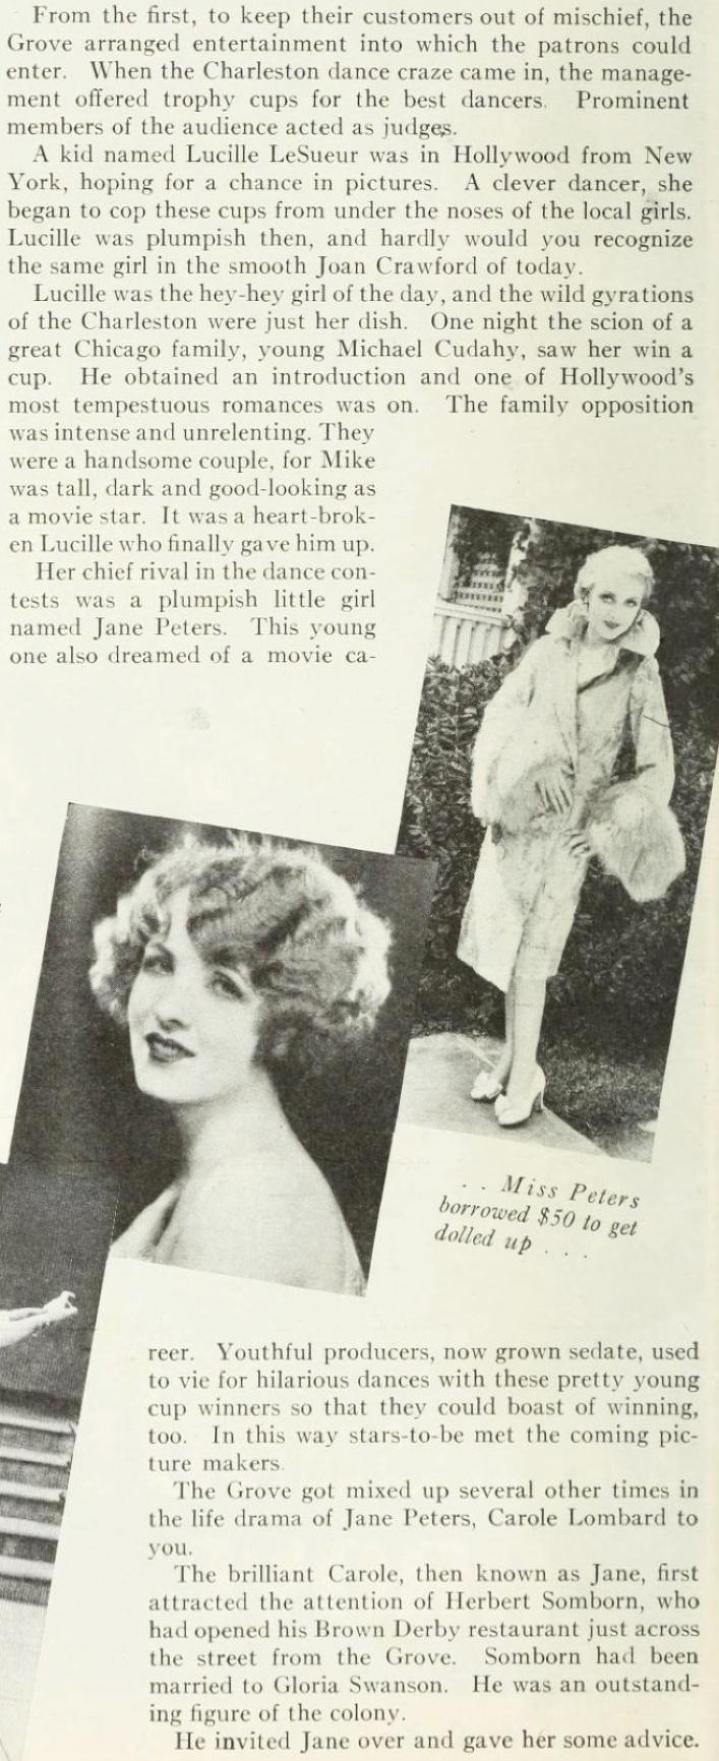 carole lombard photoplay april 1937db